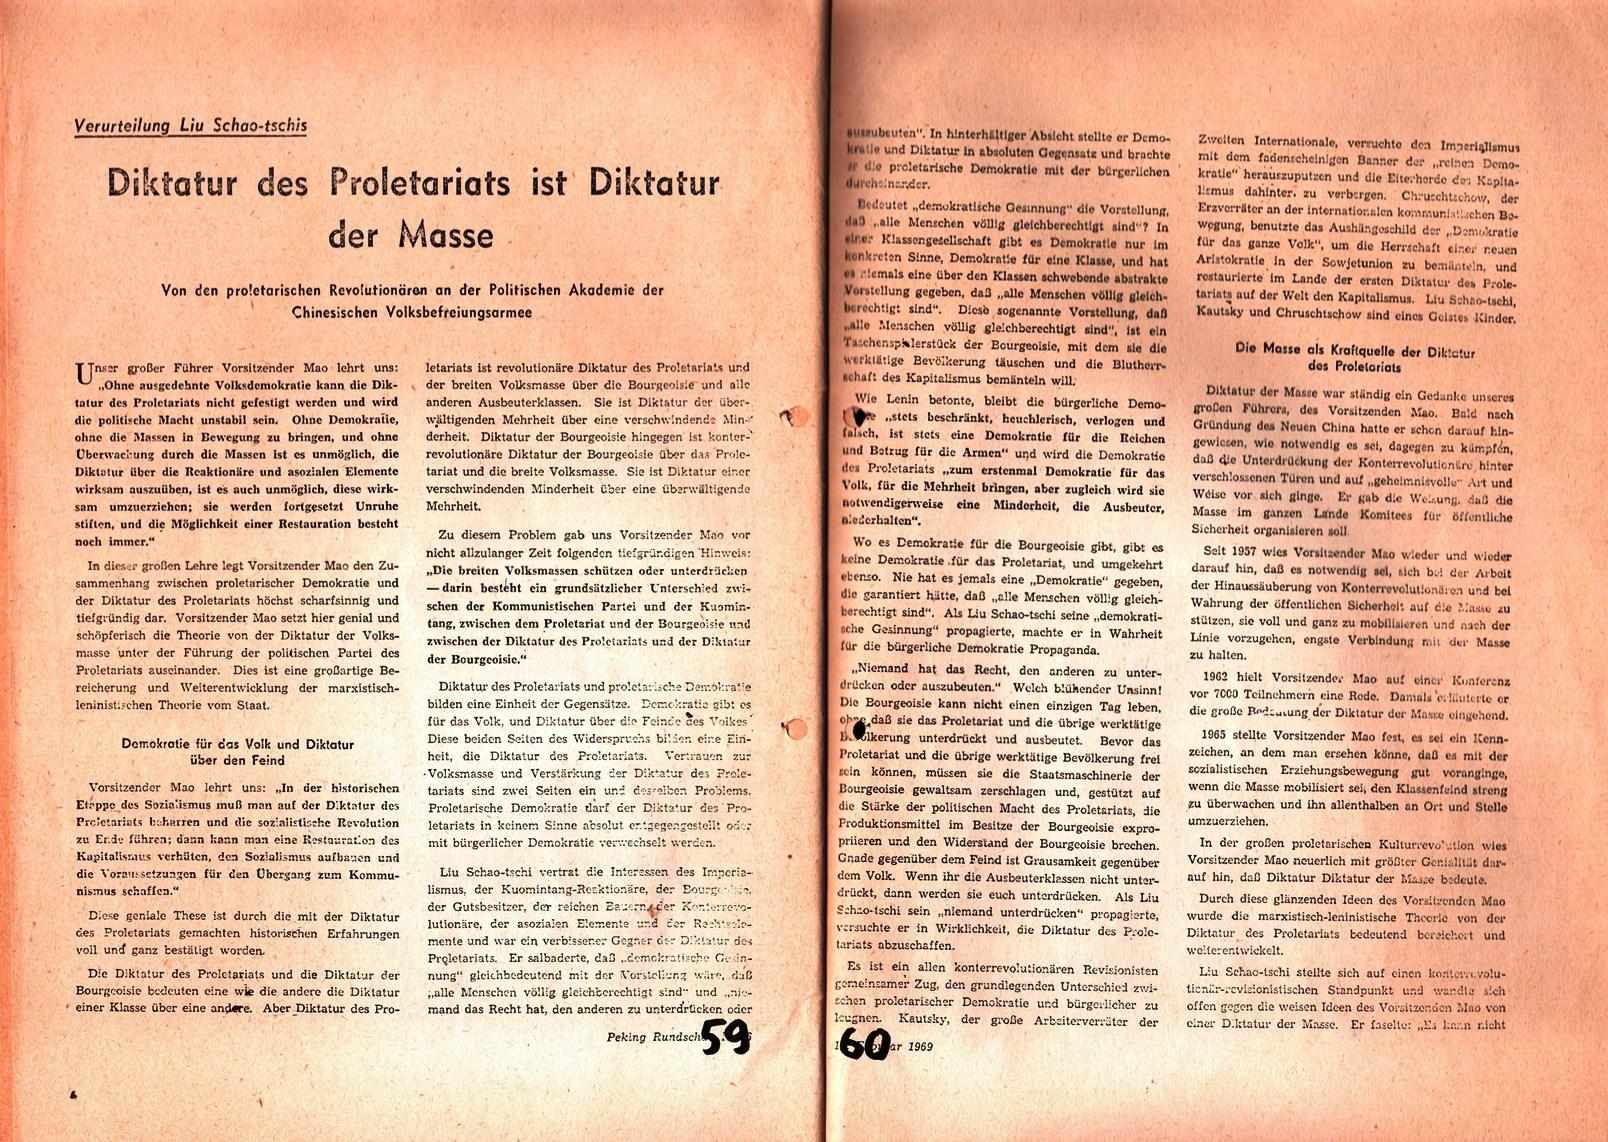 KSV_1974_Materialien_zur_Programmdiskussion_01_031